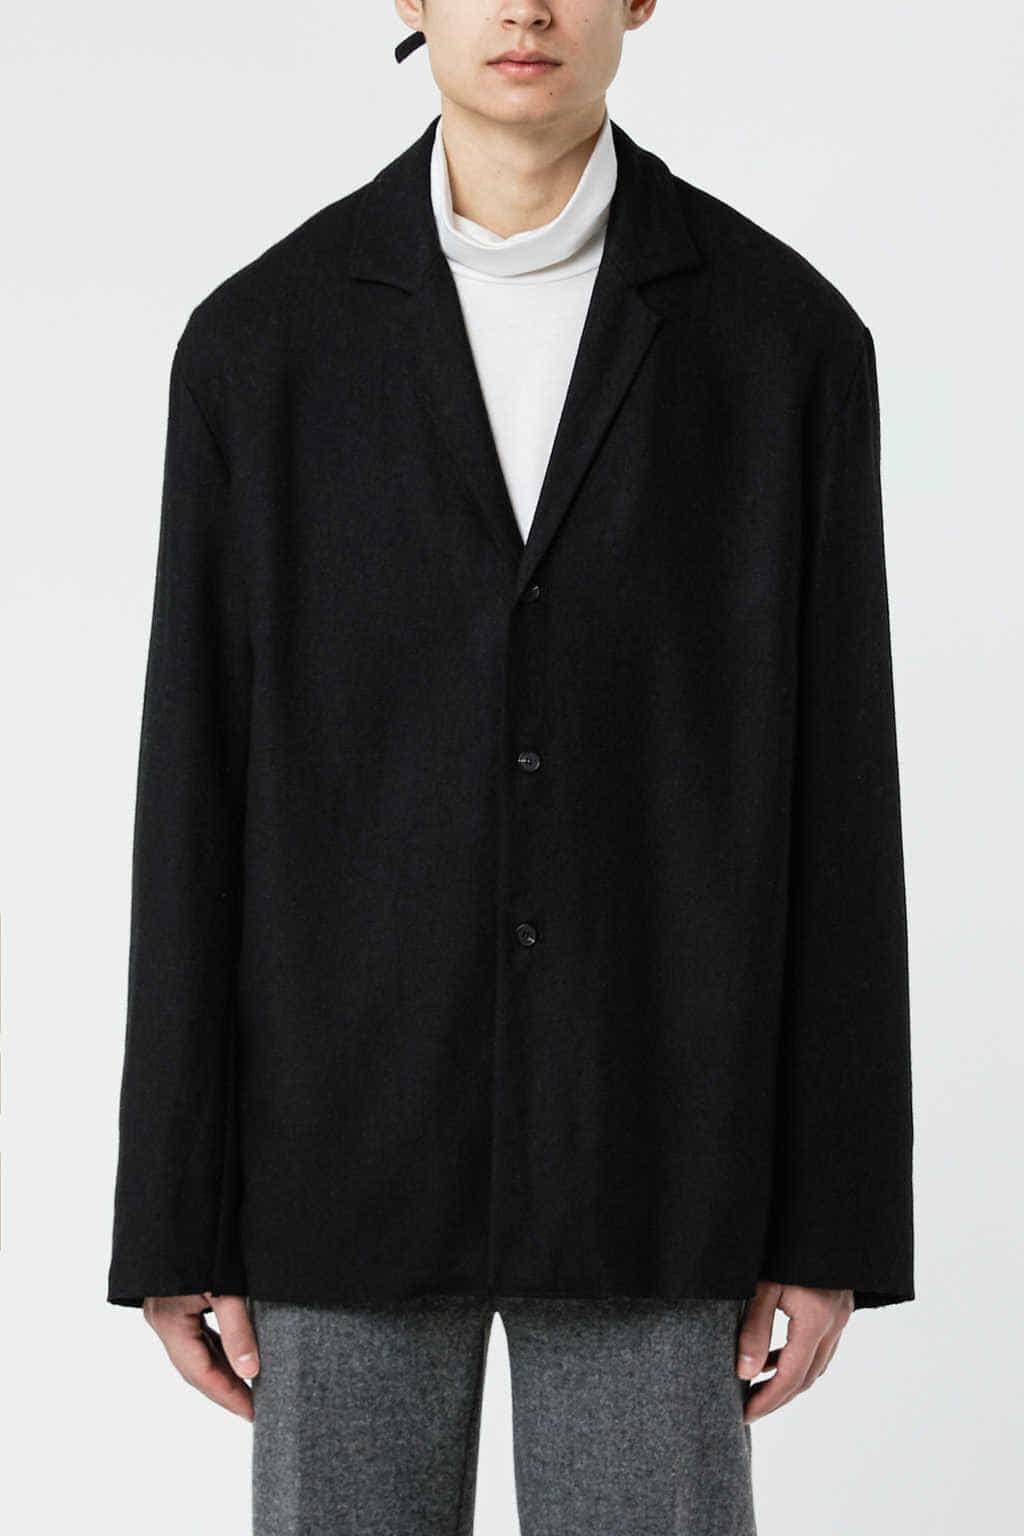 Jacket J002M Black 7